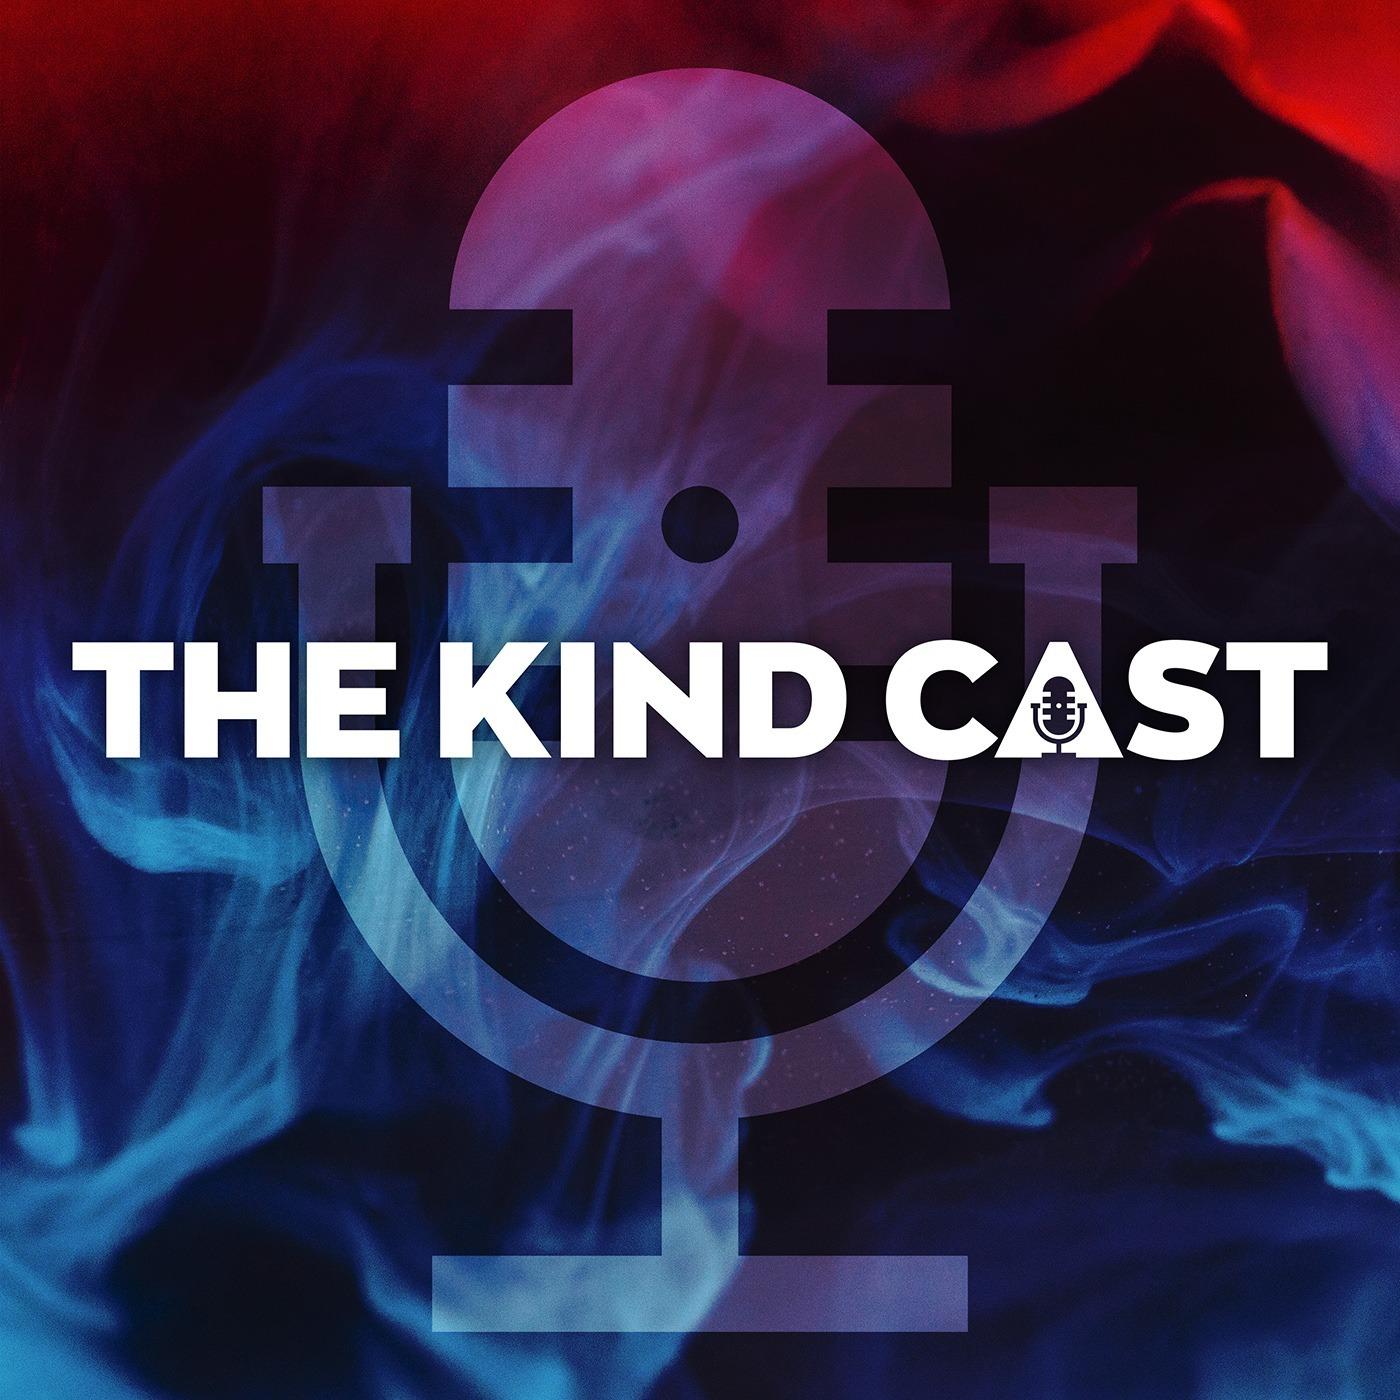 The Kind Cast Episode 1